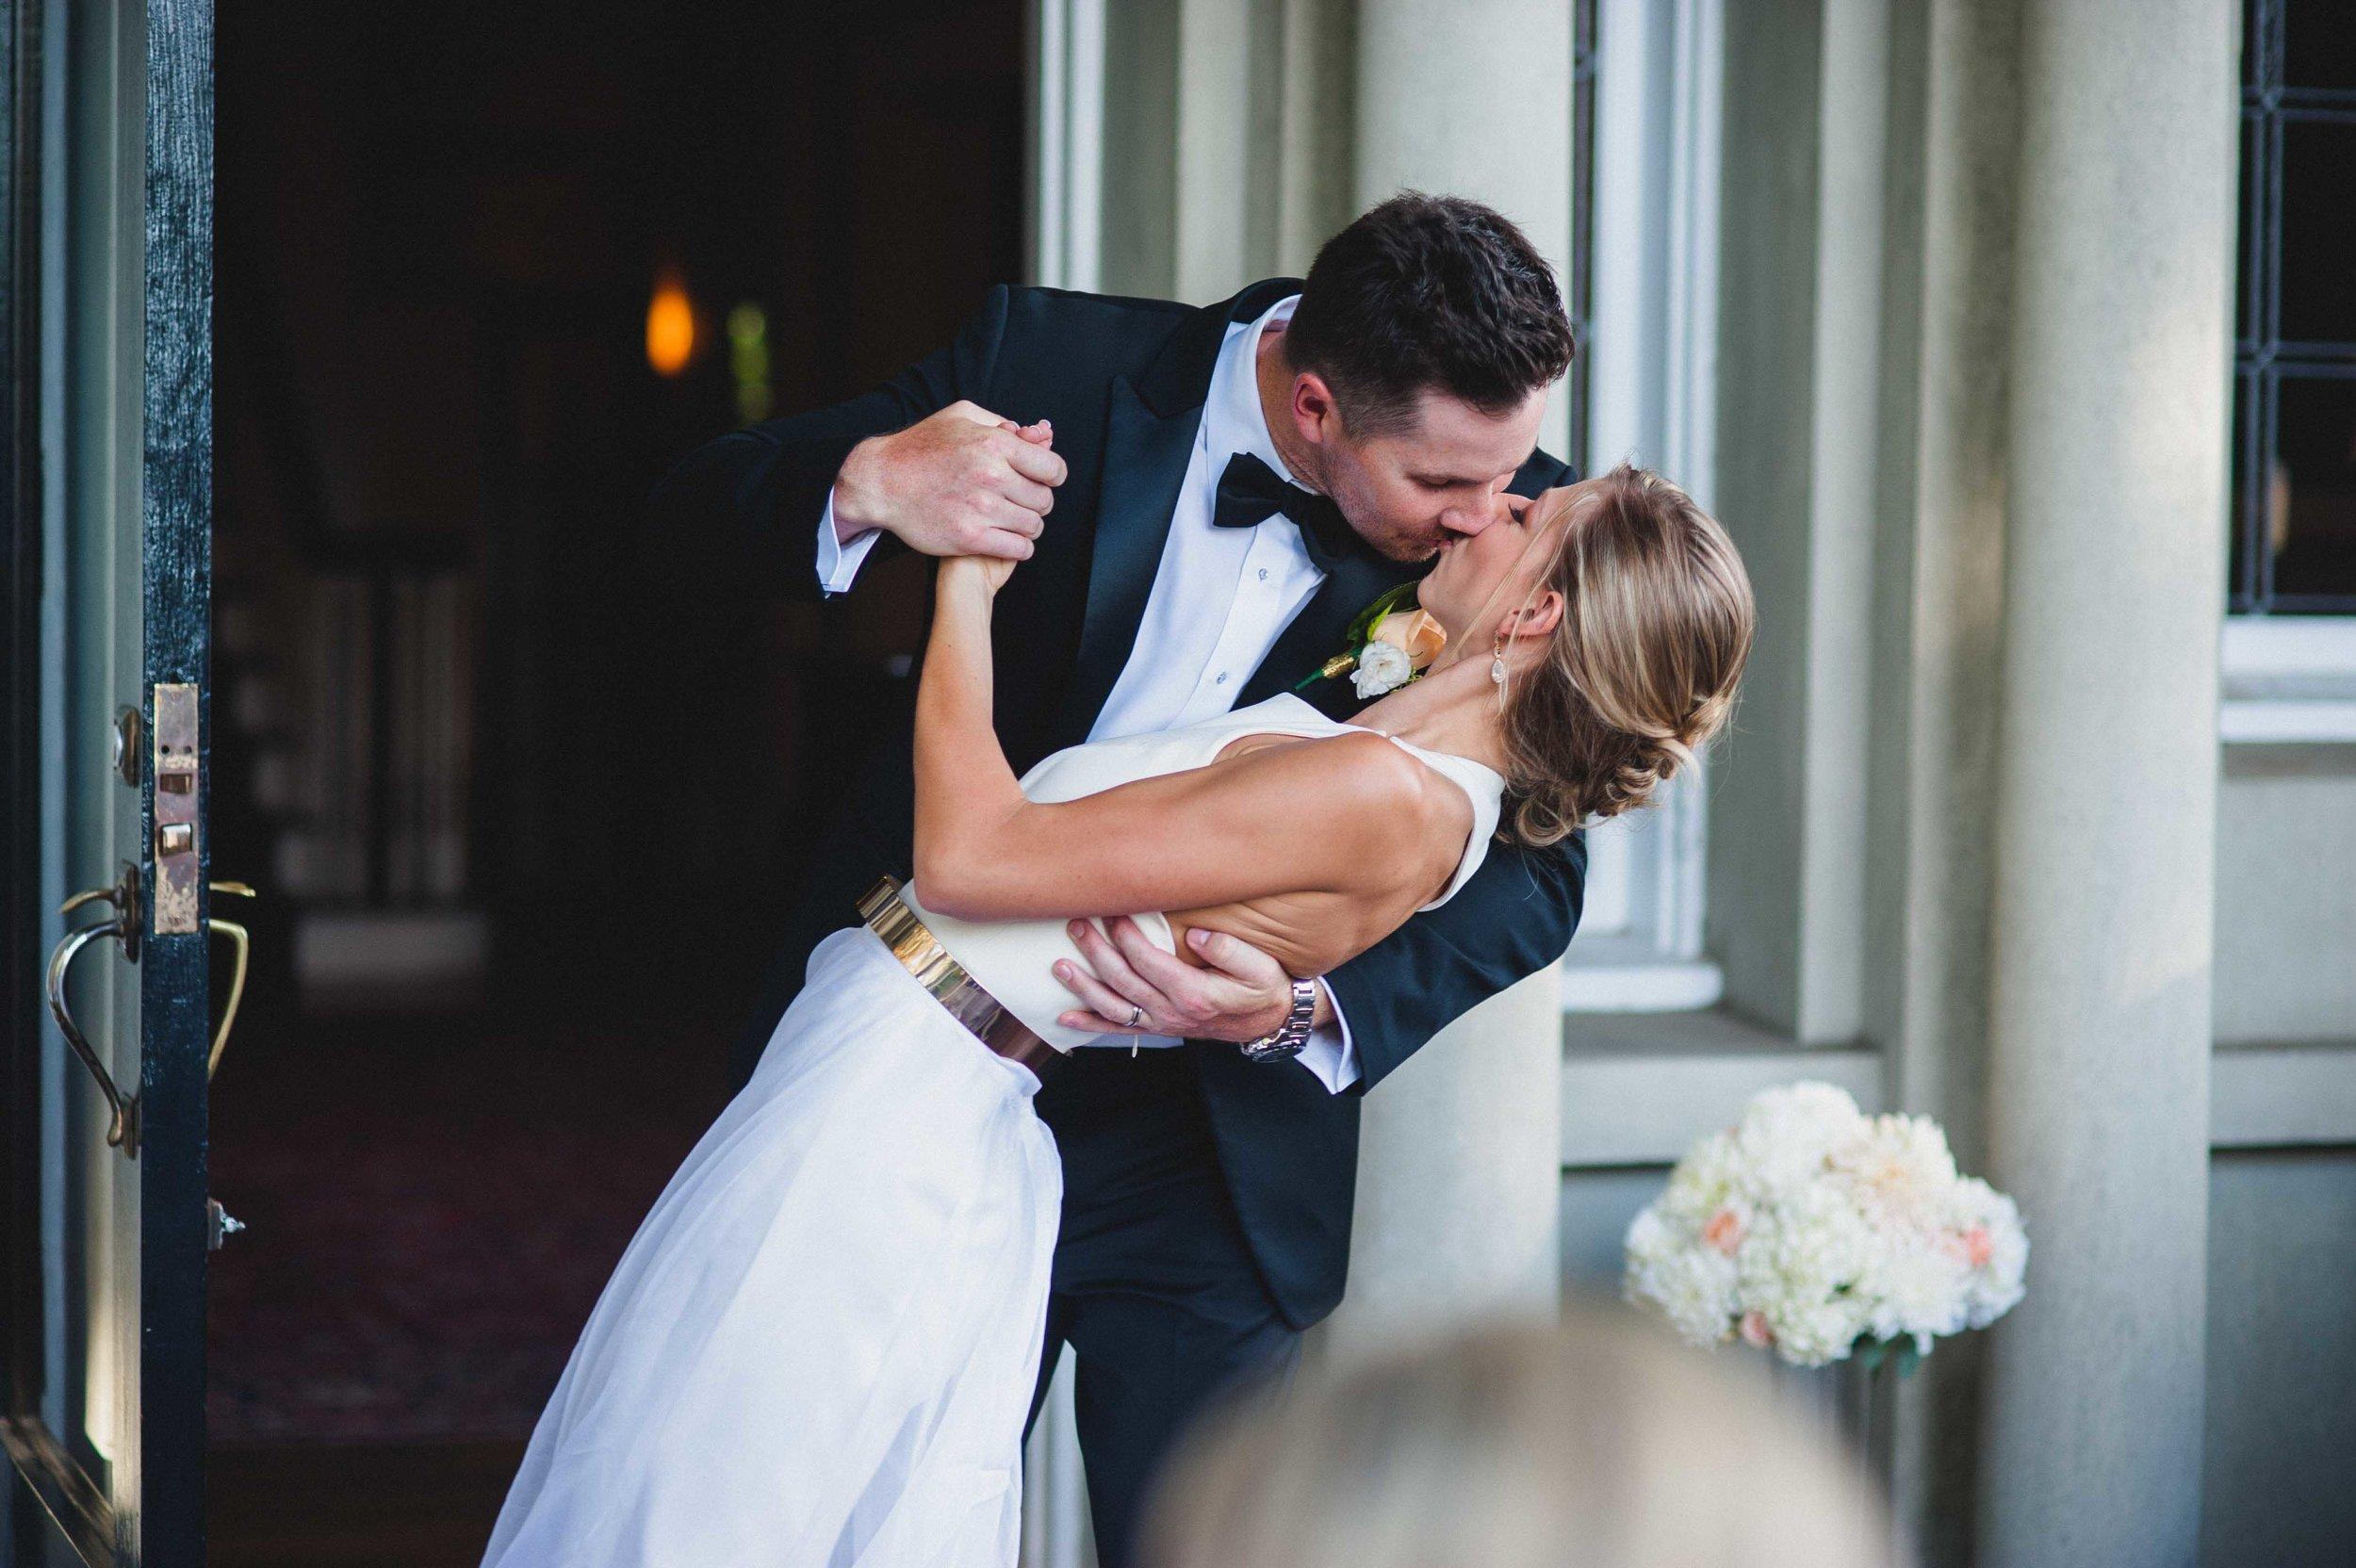 vancouver-hycroft-wedding-photographer-edward-lai-photography-13.jpg